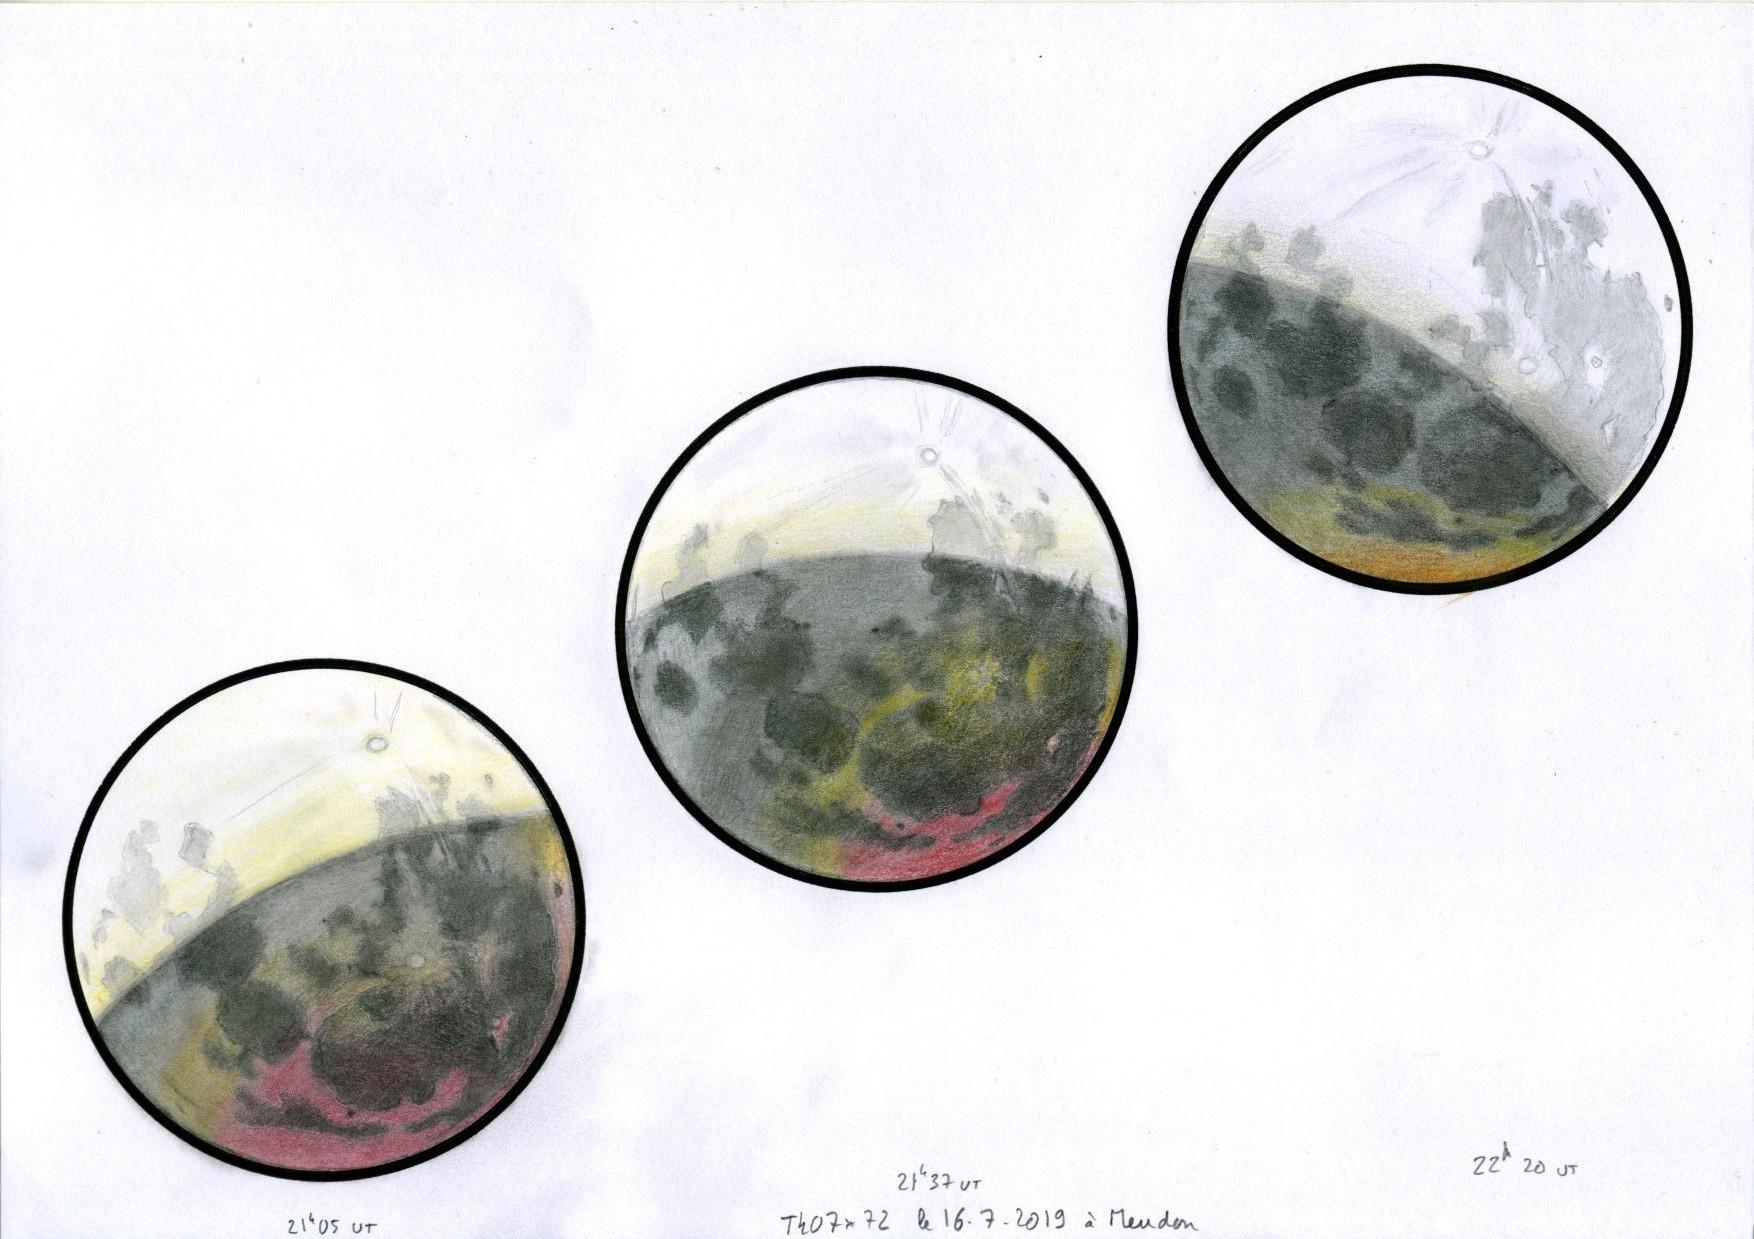 eclipse-lune-160719-21h05-22h20-t407x72.jpg